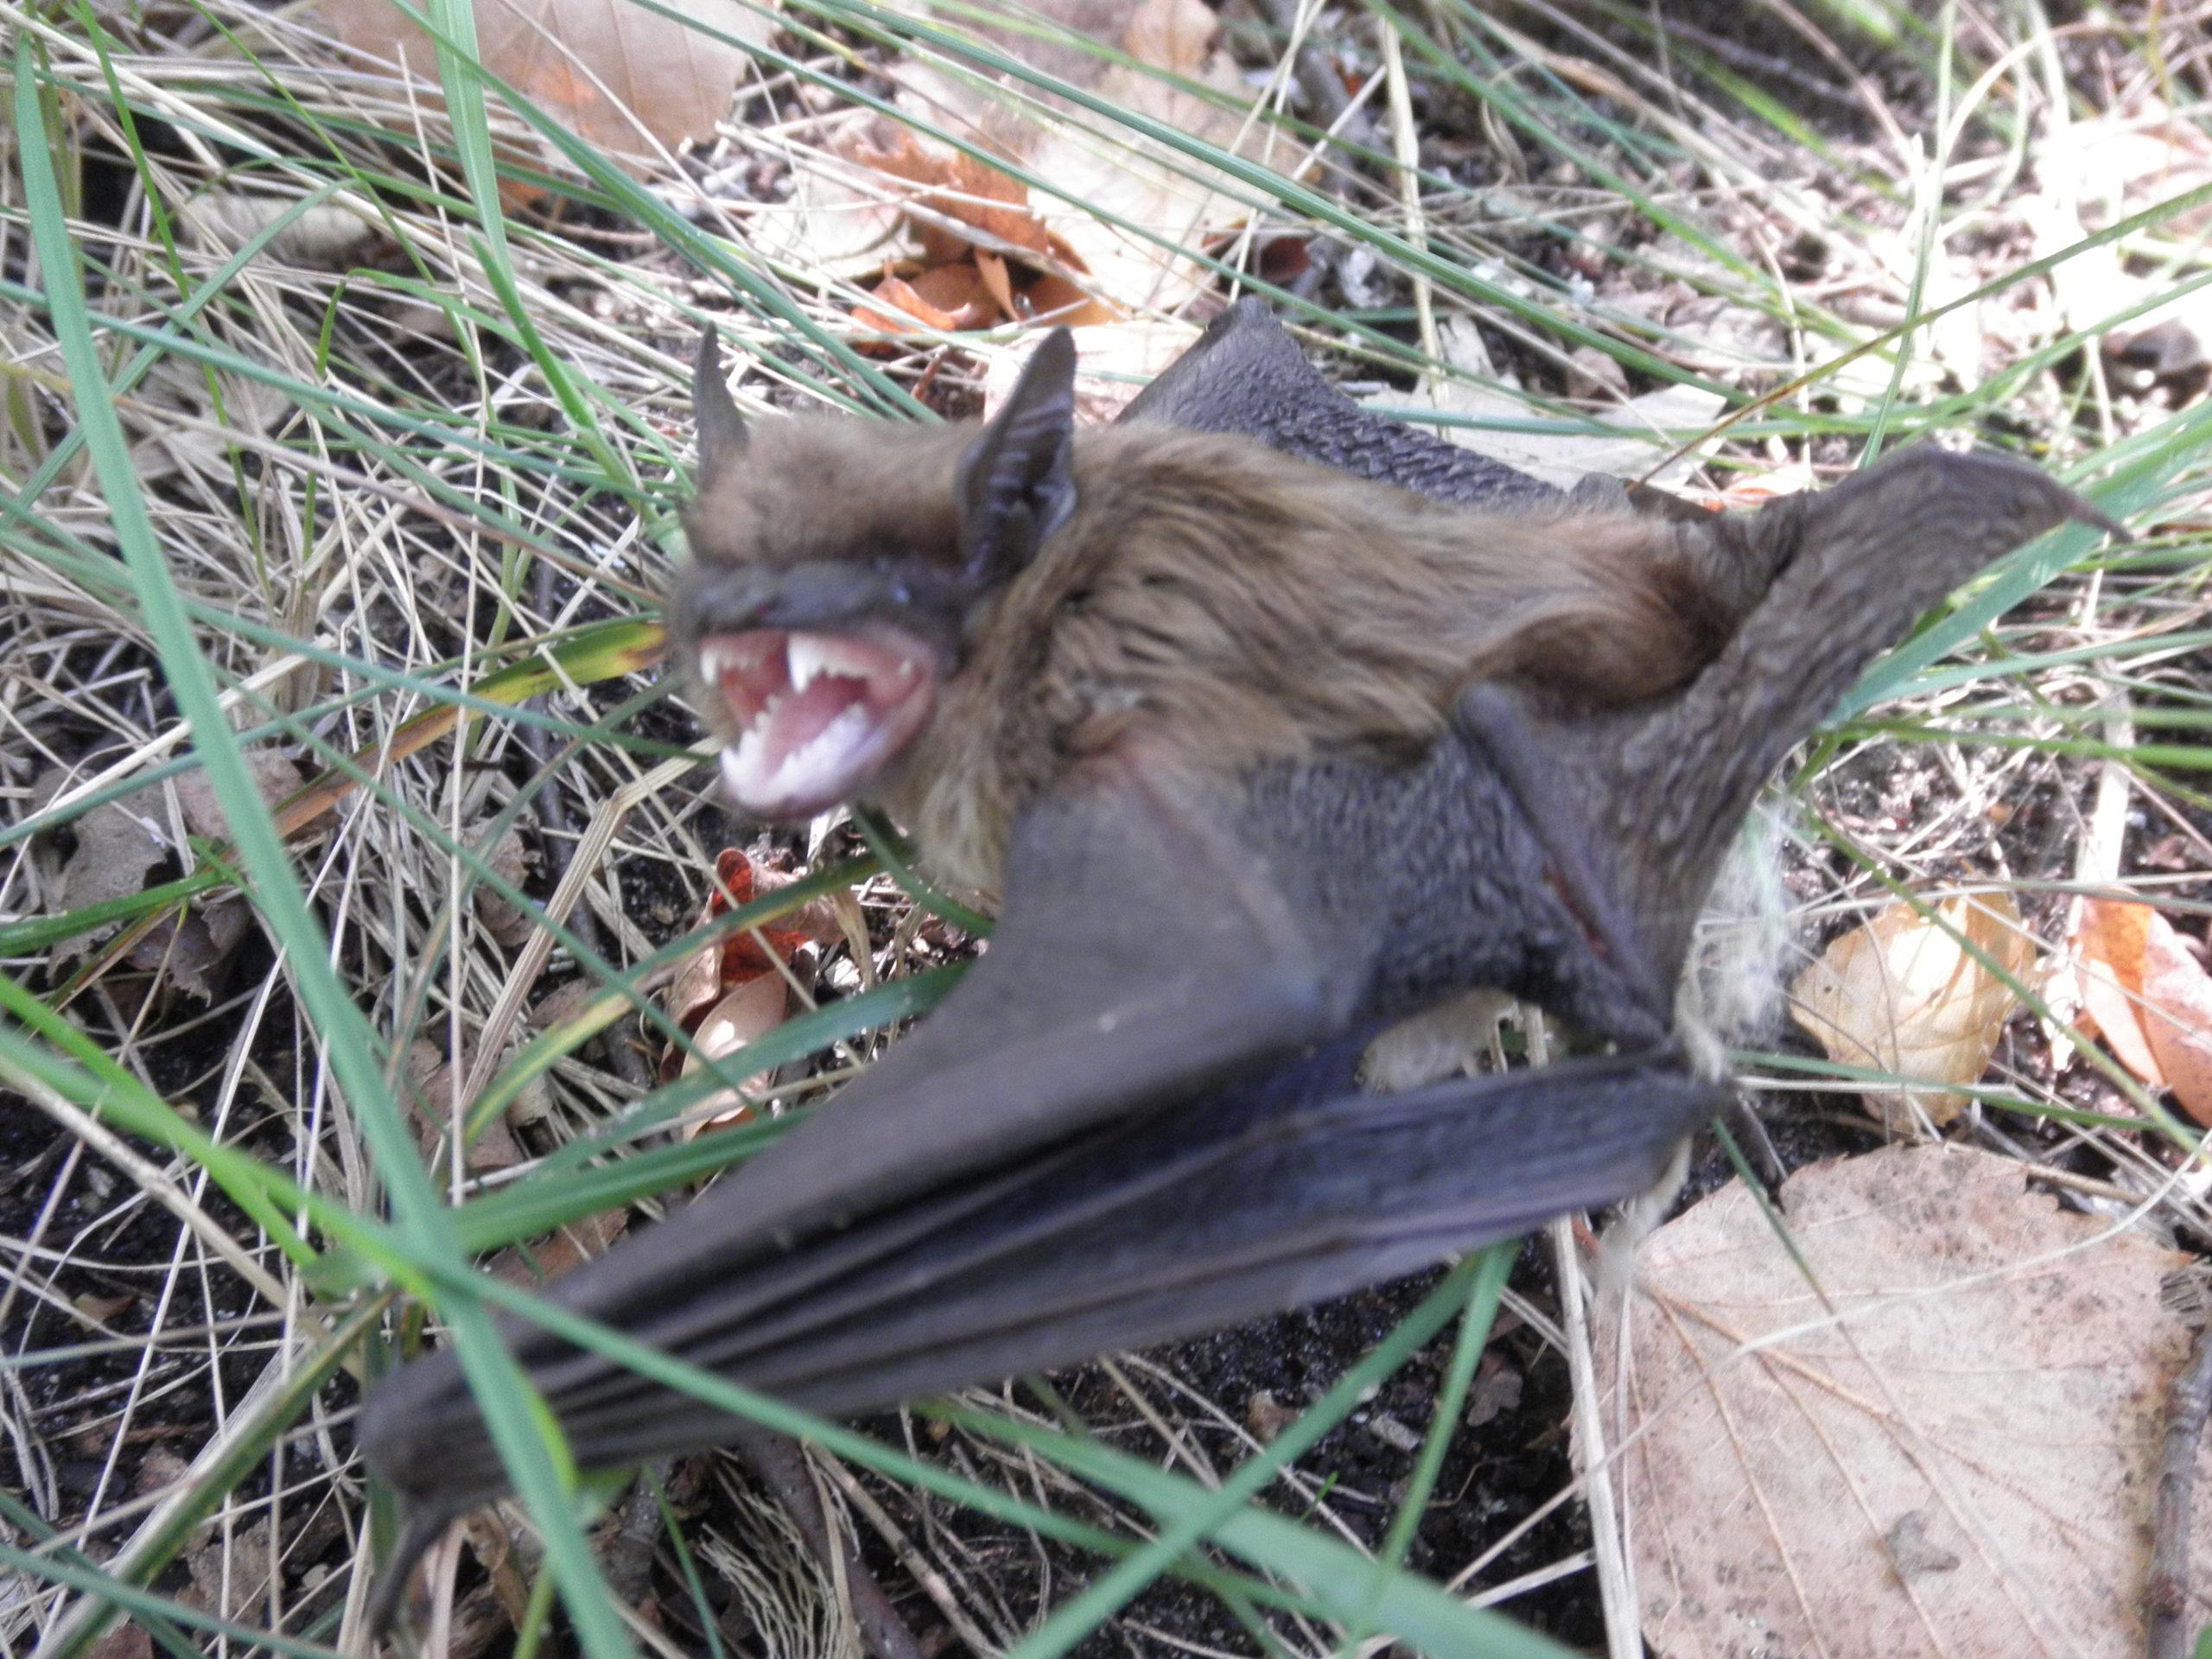 Photograph of big brown bat showing it's teeth